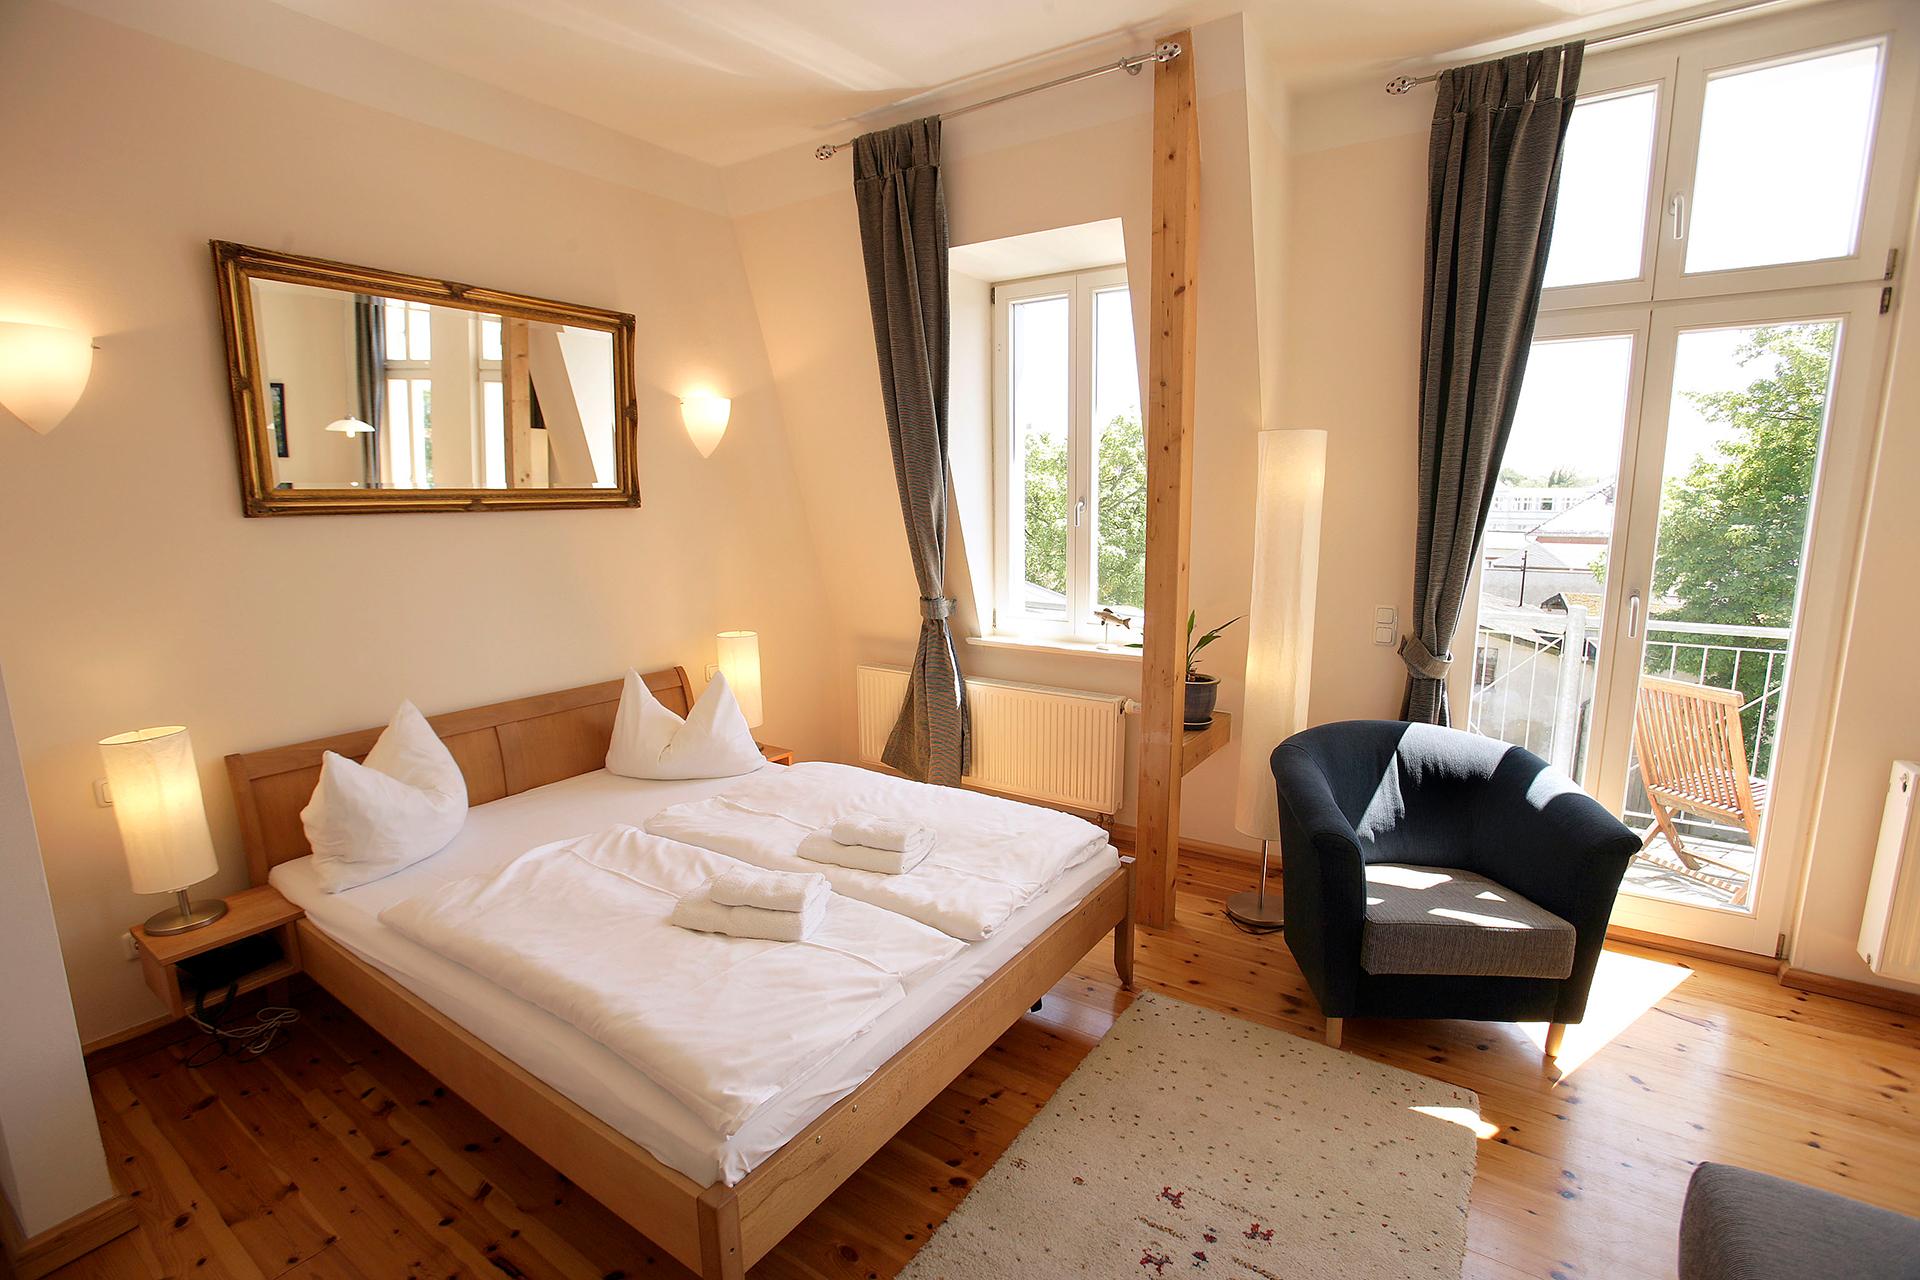 glaeser app24 01 villa glaeser ferienwohnungen bansin. Black Bedroom Furniture Sets. Home Design Ideas